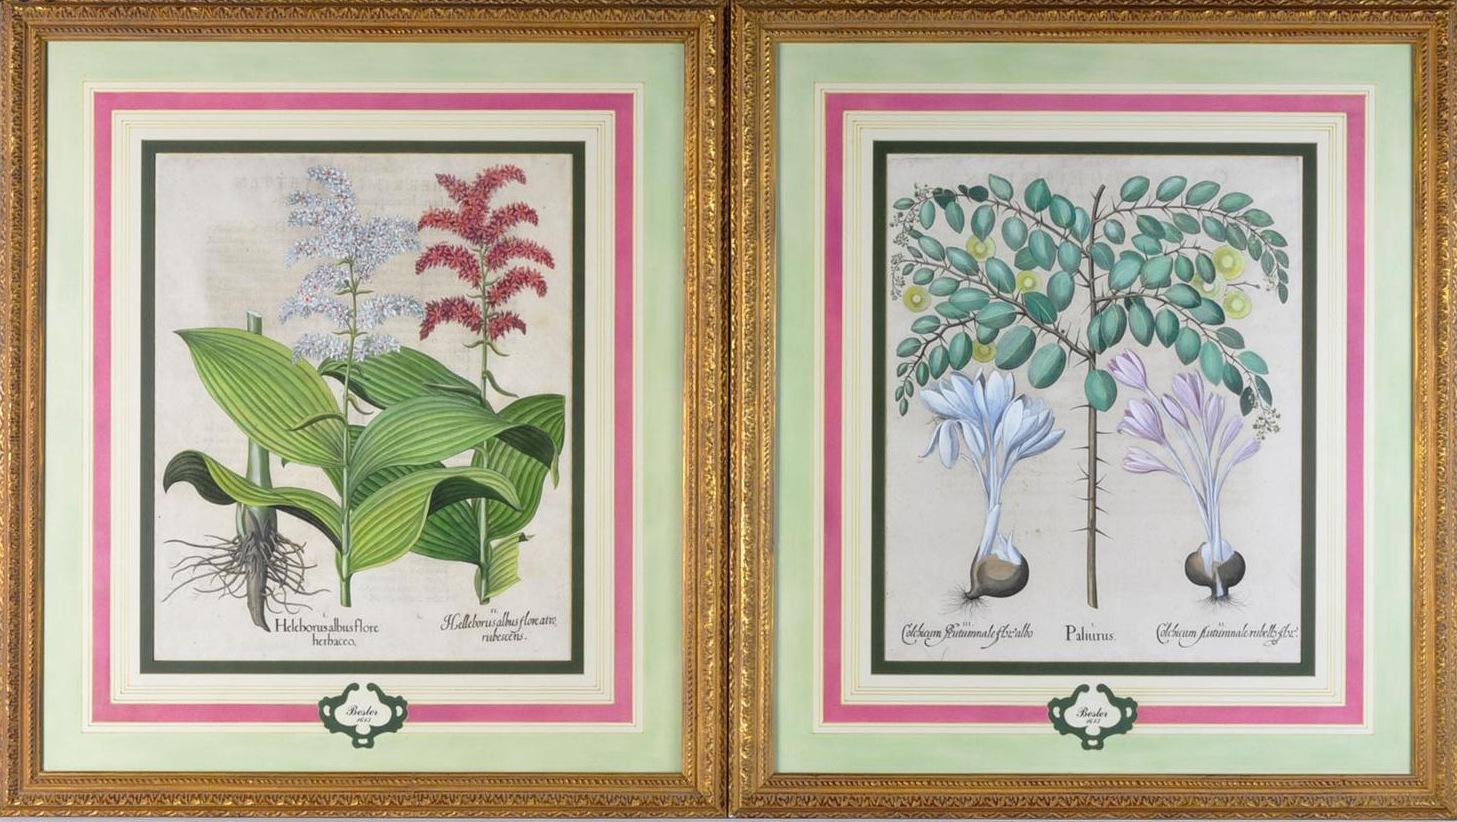 French matts on antique botanical prints by Basilius Besler